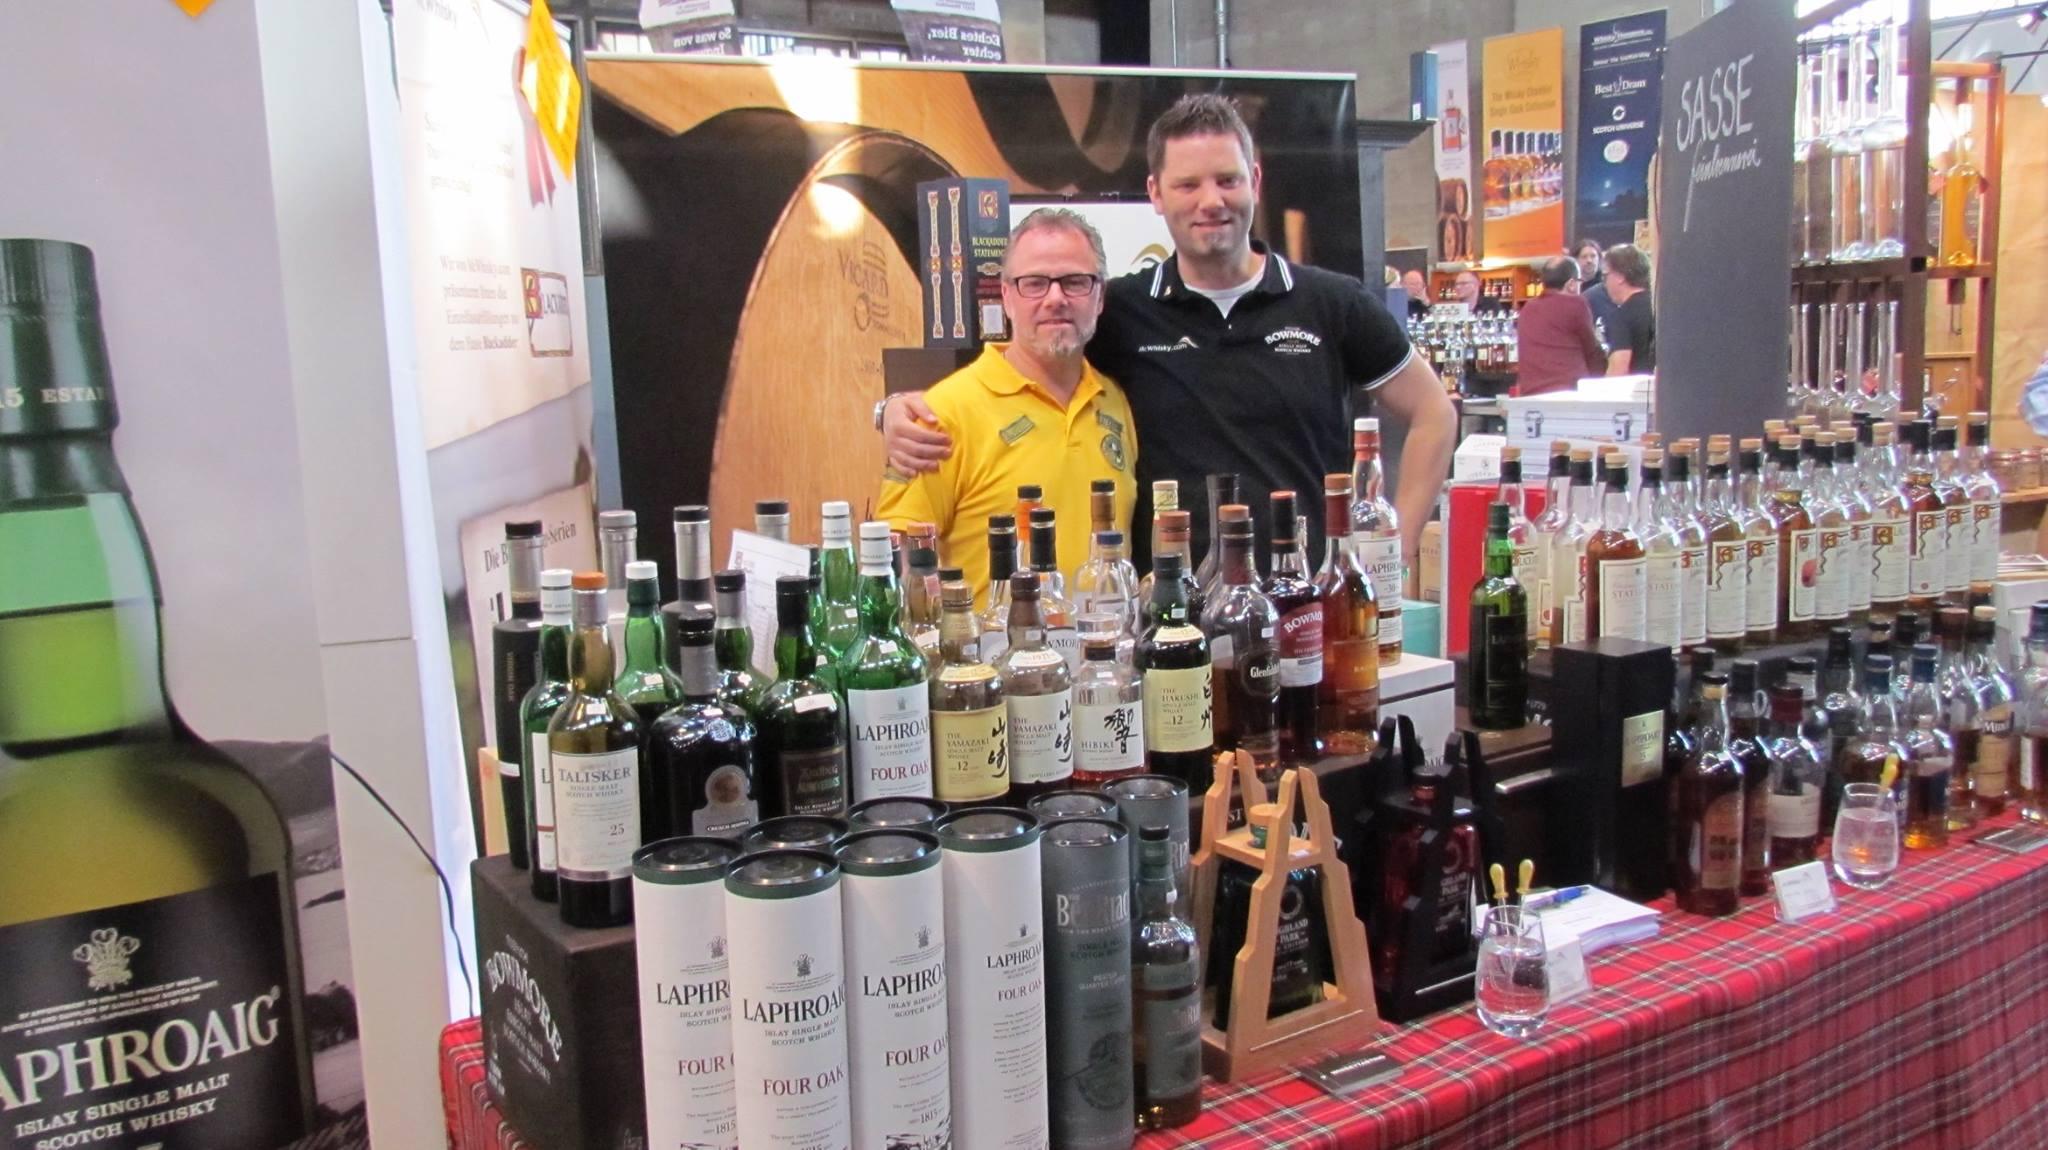 Whiskyfair Rhein Ruhr 2017 1